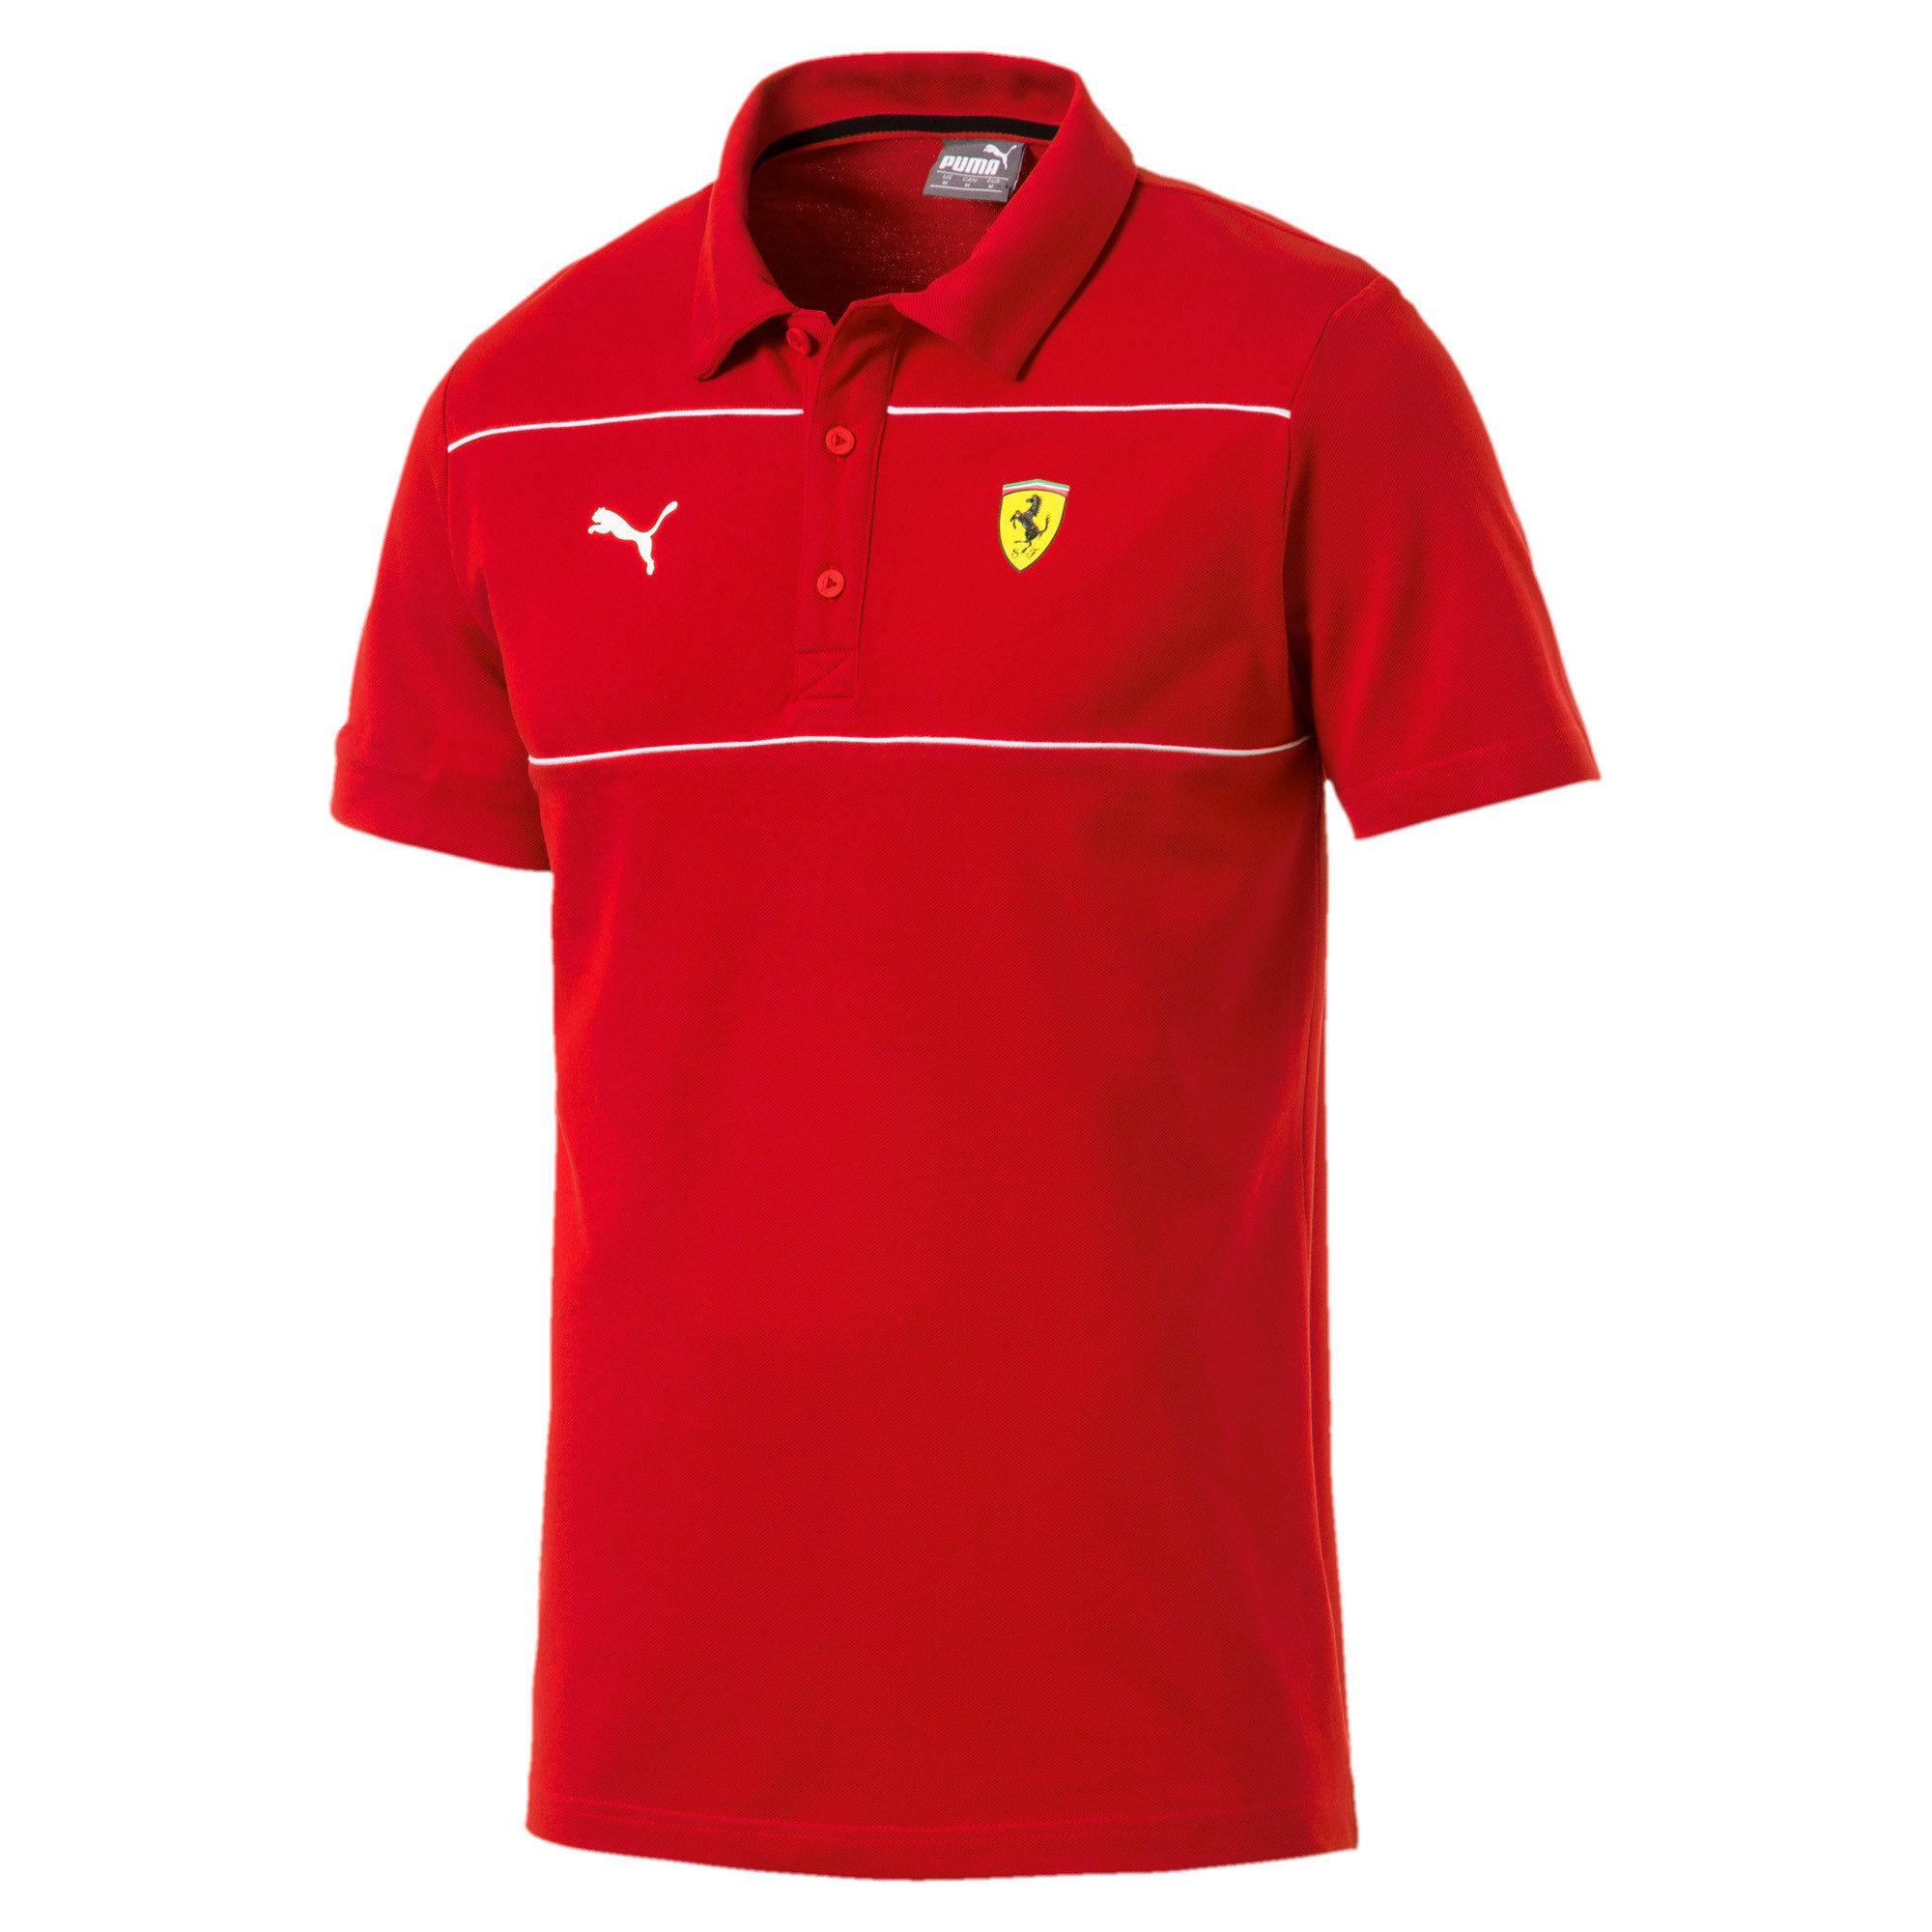 Thumbnail 4 of Scuderia Ferrari Men's Polo, Rosso Corsa, medium